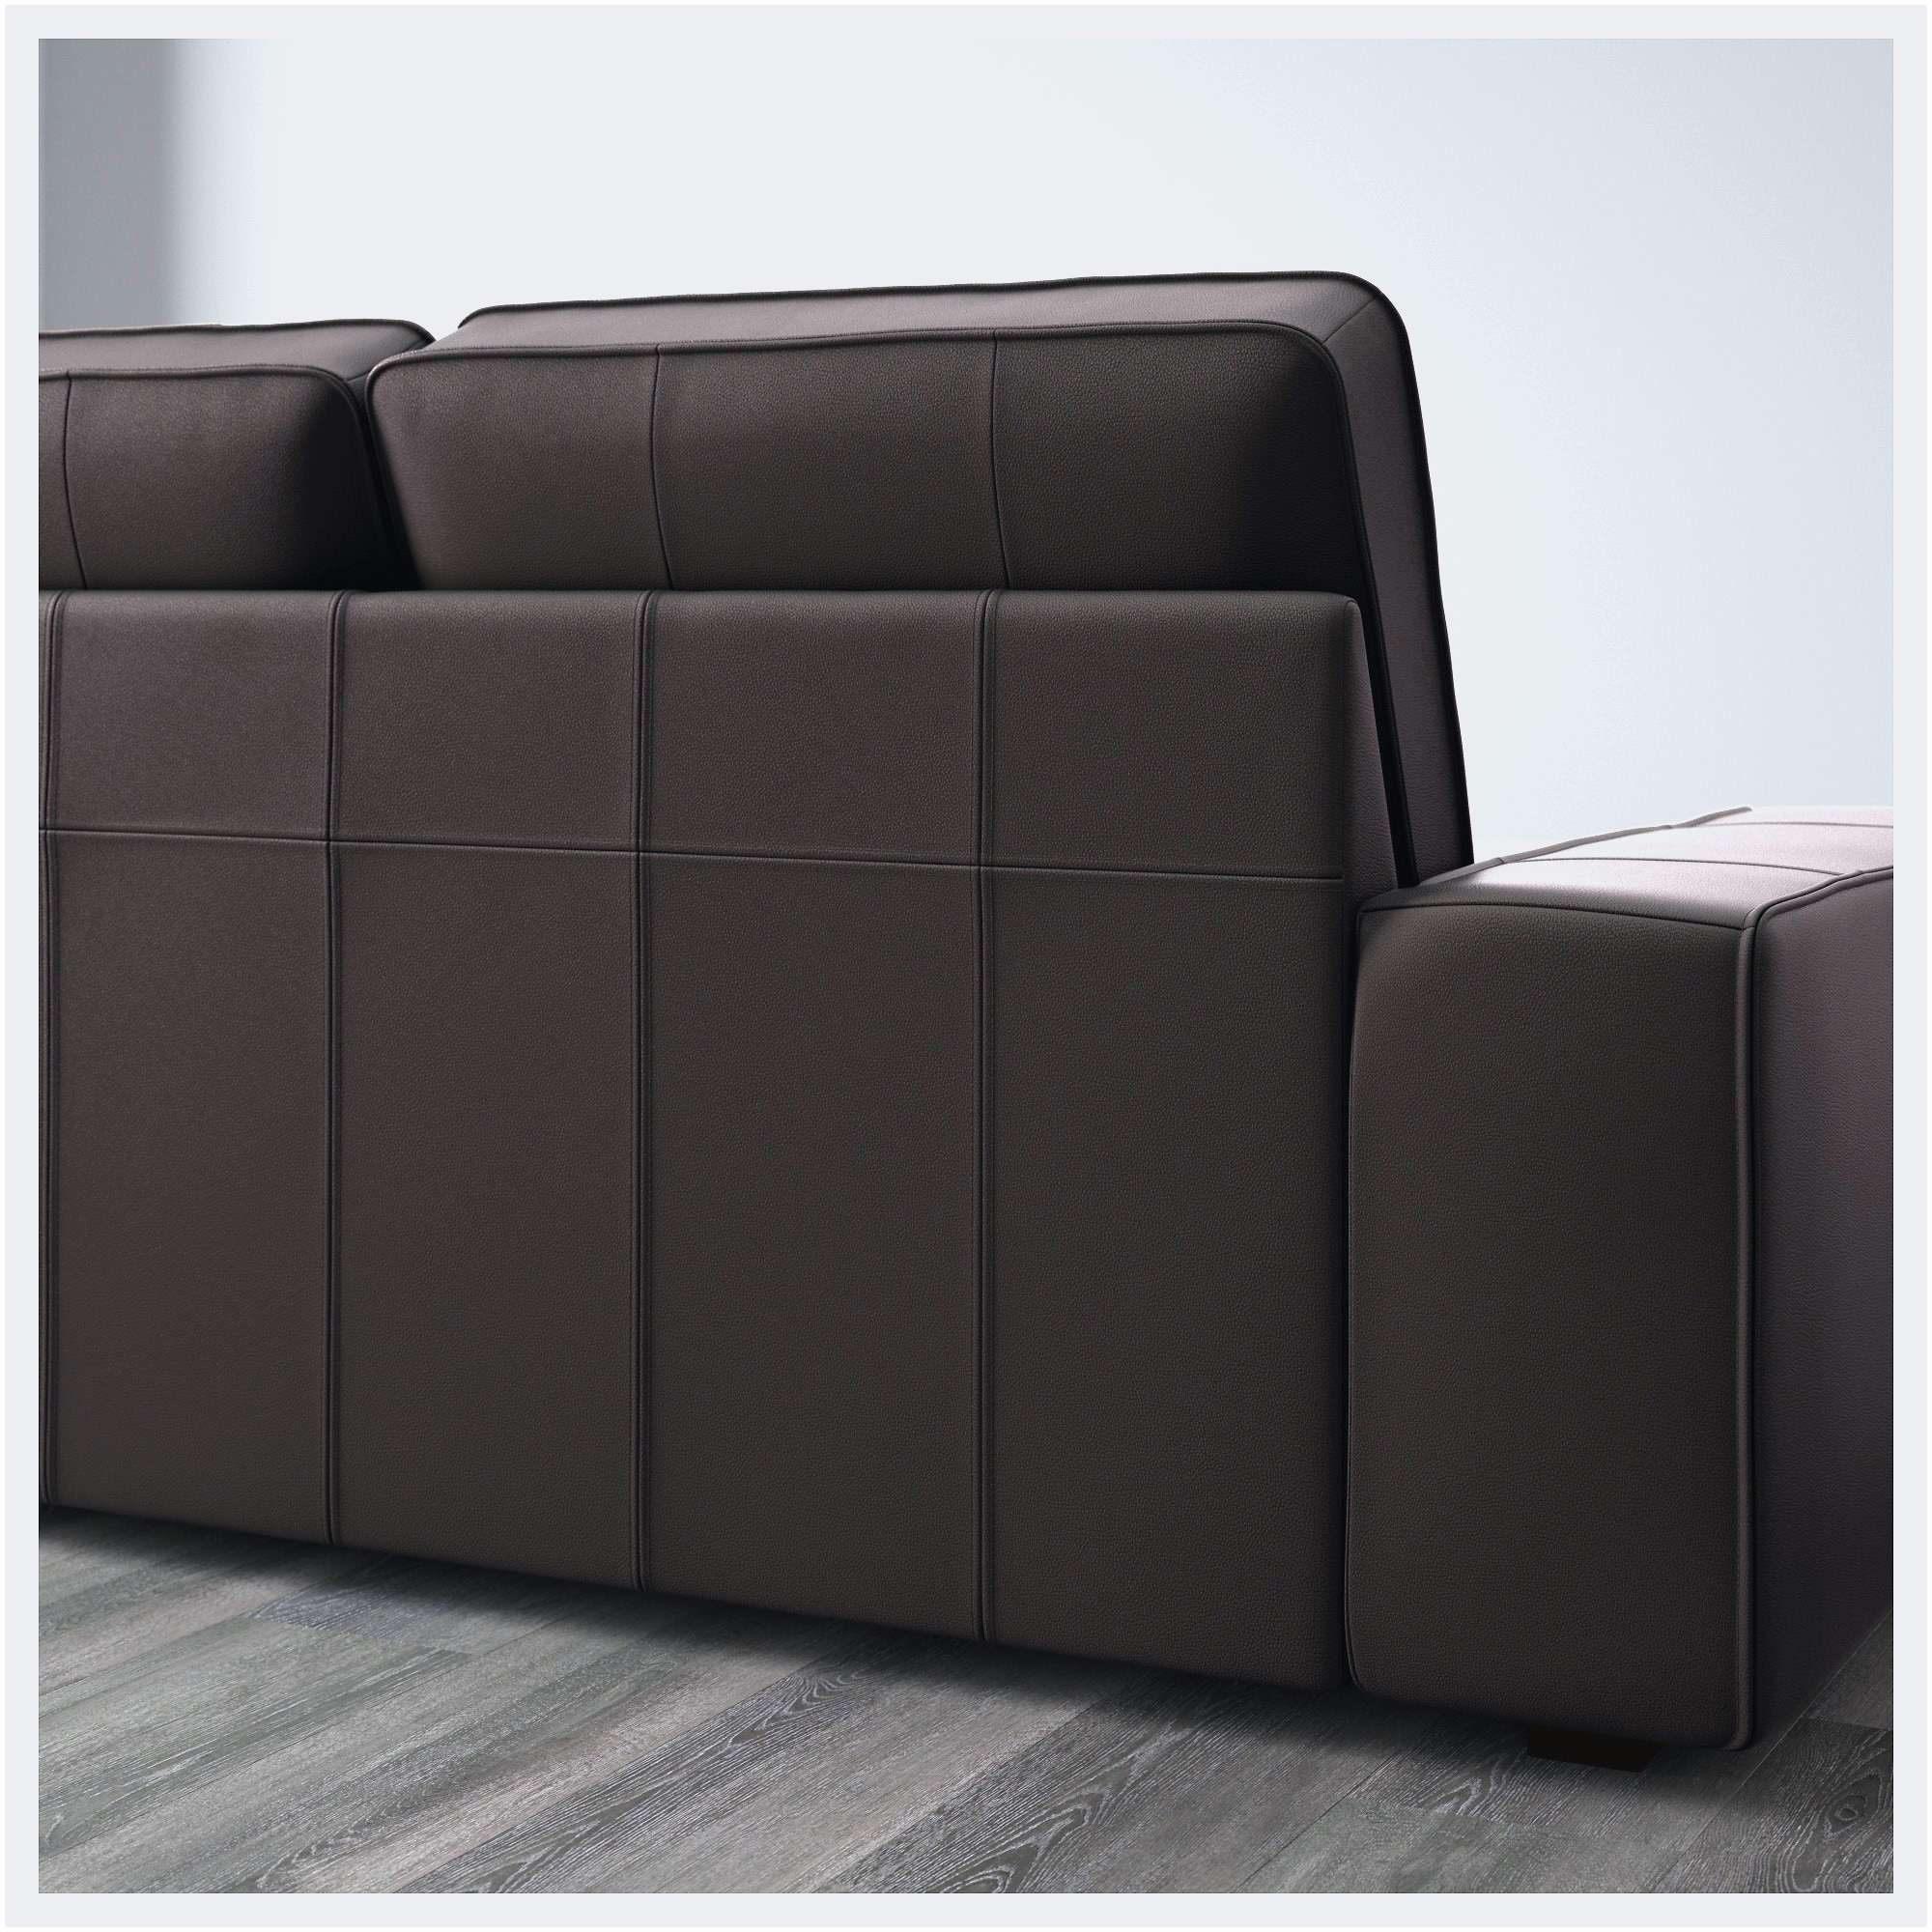 60 Canapé Lit Gigogne Ikea Vue Jongor4hire